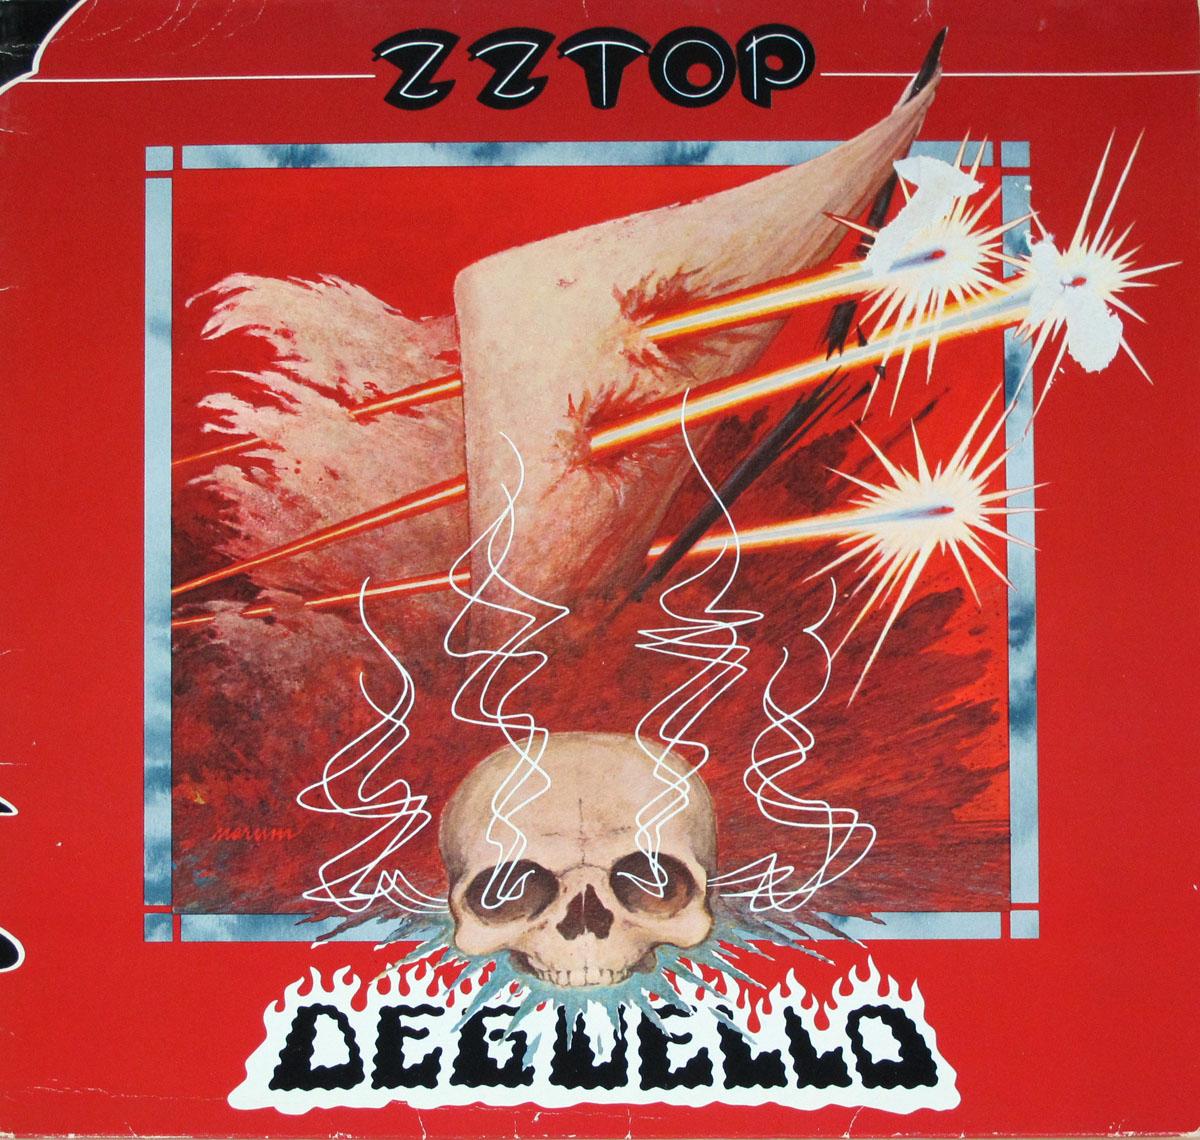 "ZZ TOP Degüello Tex-Mex Blues-Rock 12"" LP Vinyl Album Cover Gallery & Information #vinylrecords"